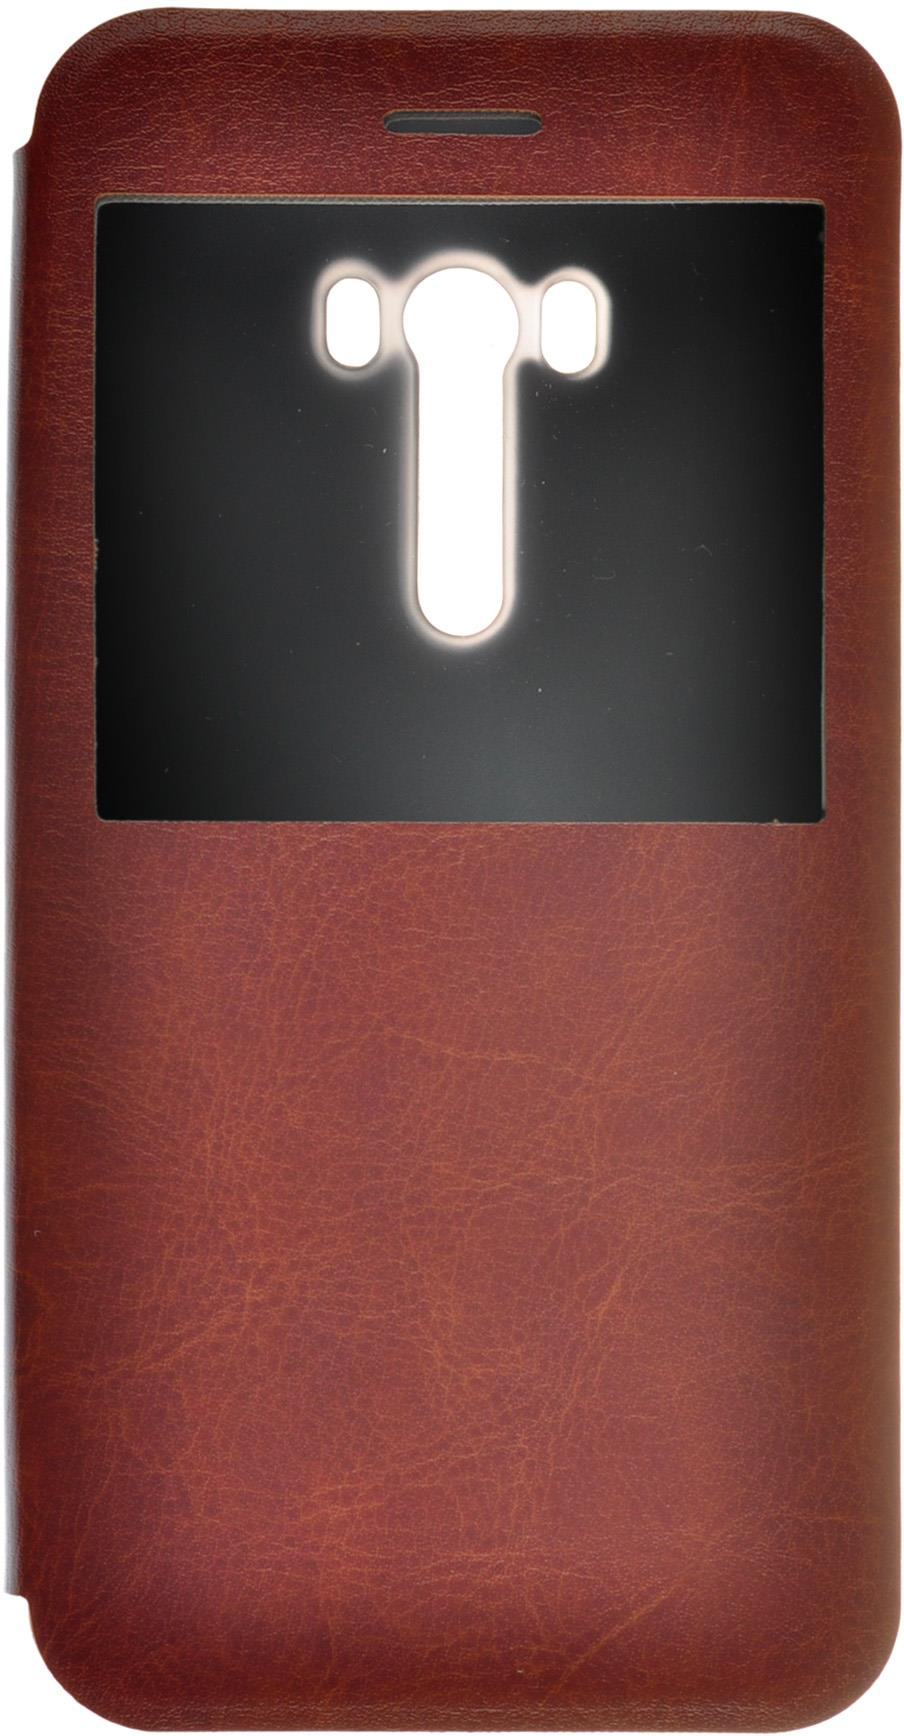 "skinBOX Lux Asus Zenfone Selfie ZD551KL Brown - (; 5.5""; поликарбонат и экокожа)"